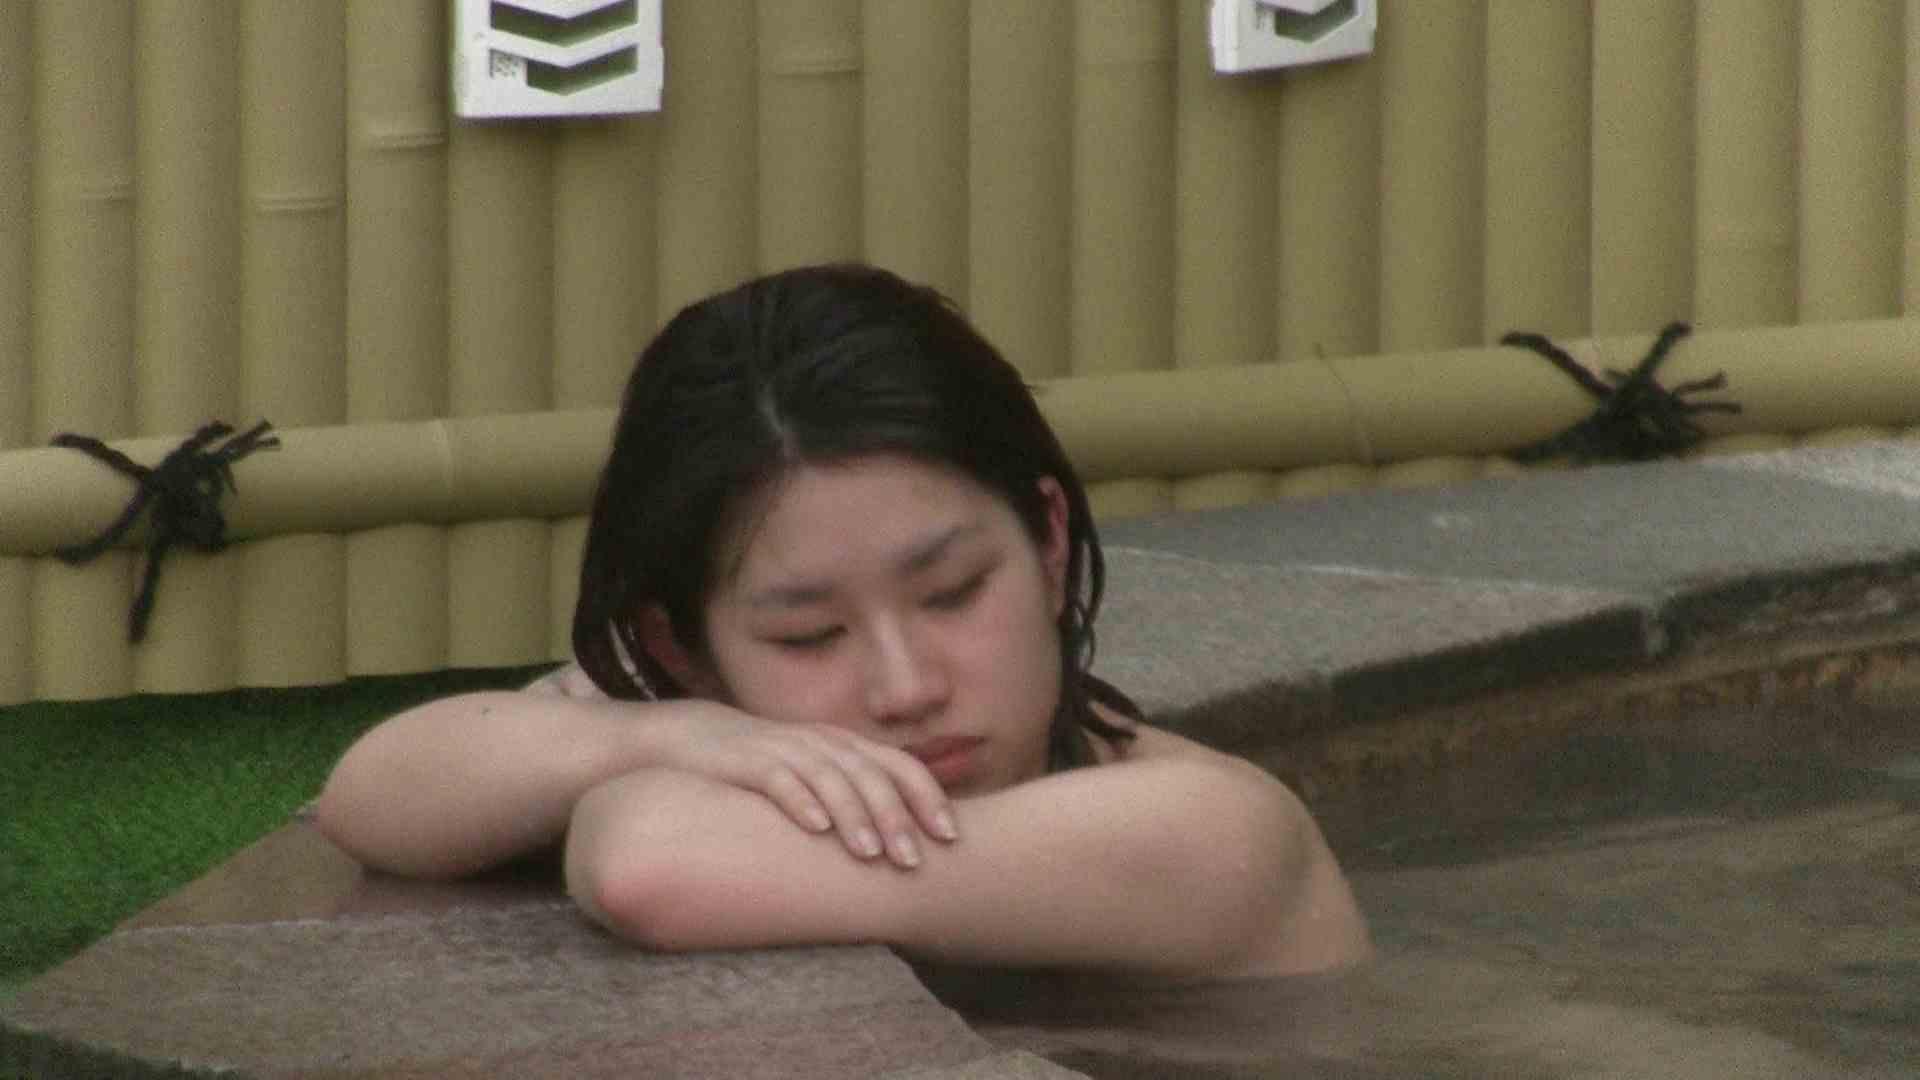 Aquaな露天風呂Vol.230 盗撮 | OLエロ画像  31PICs 13